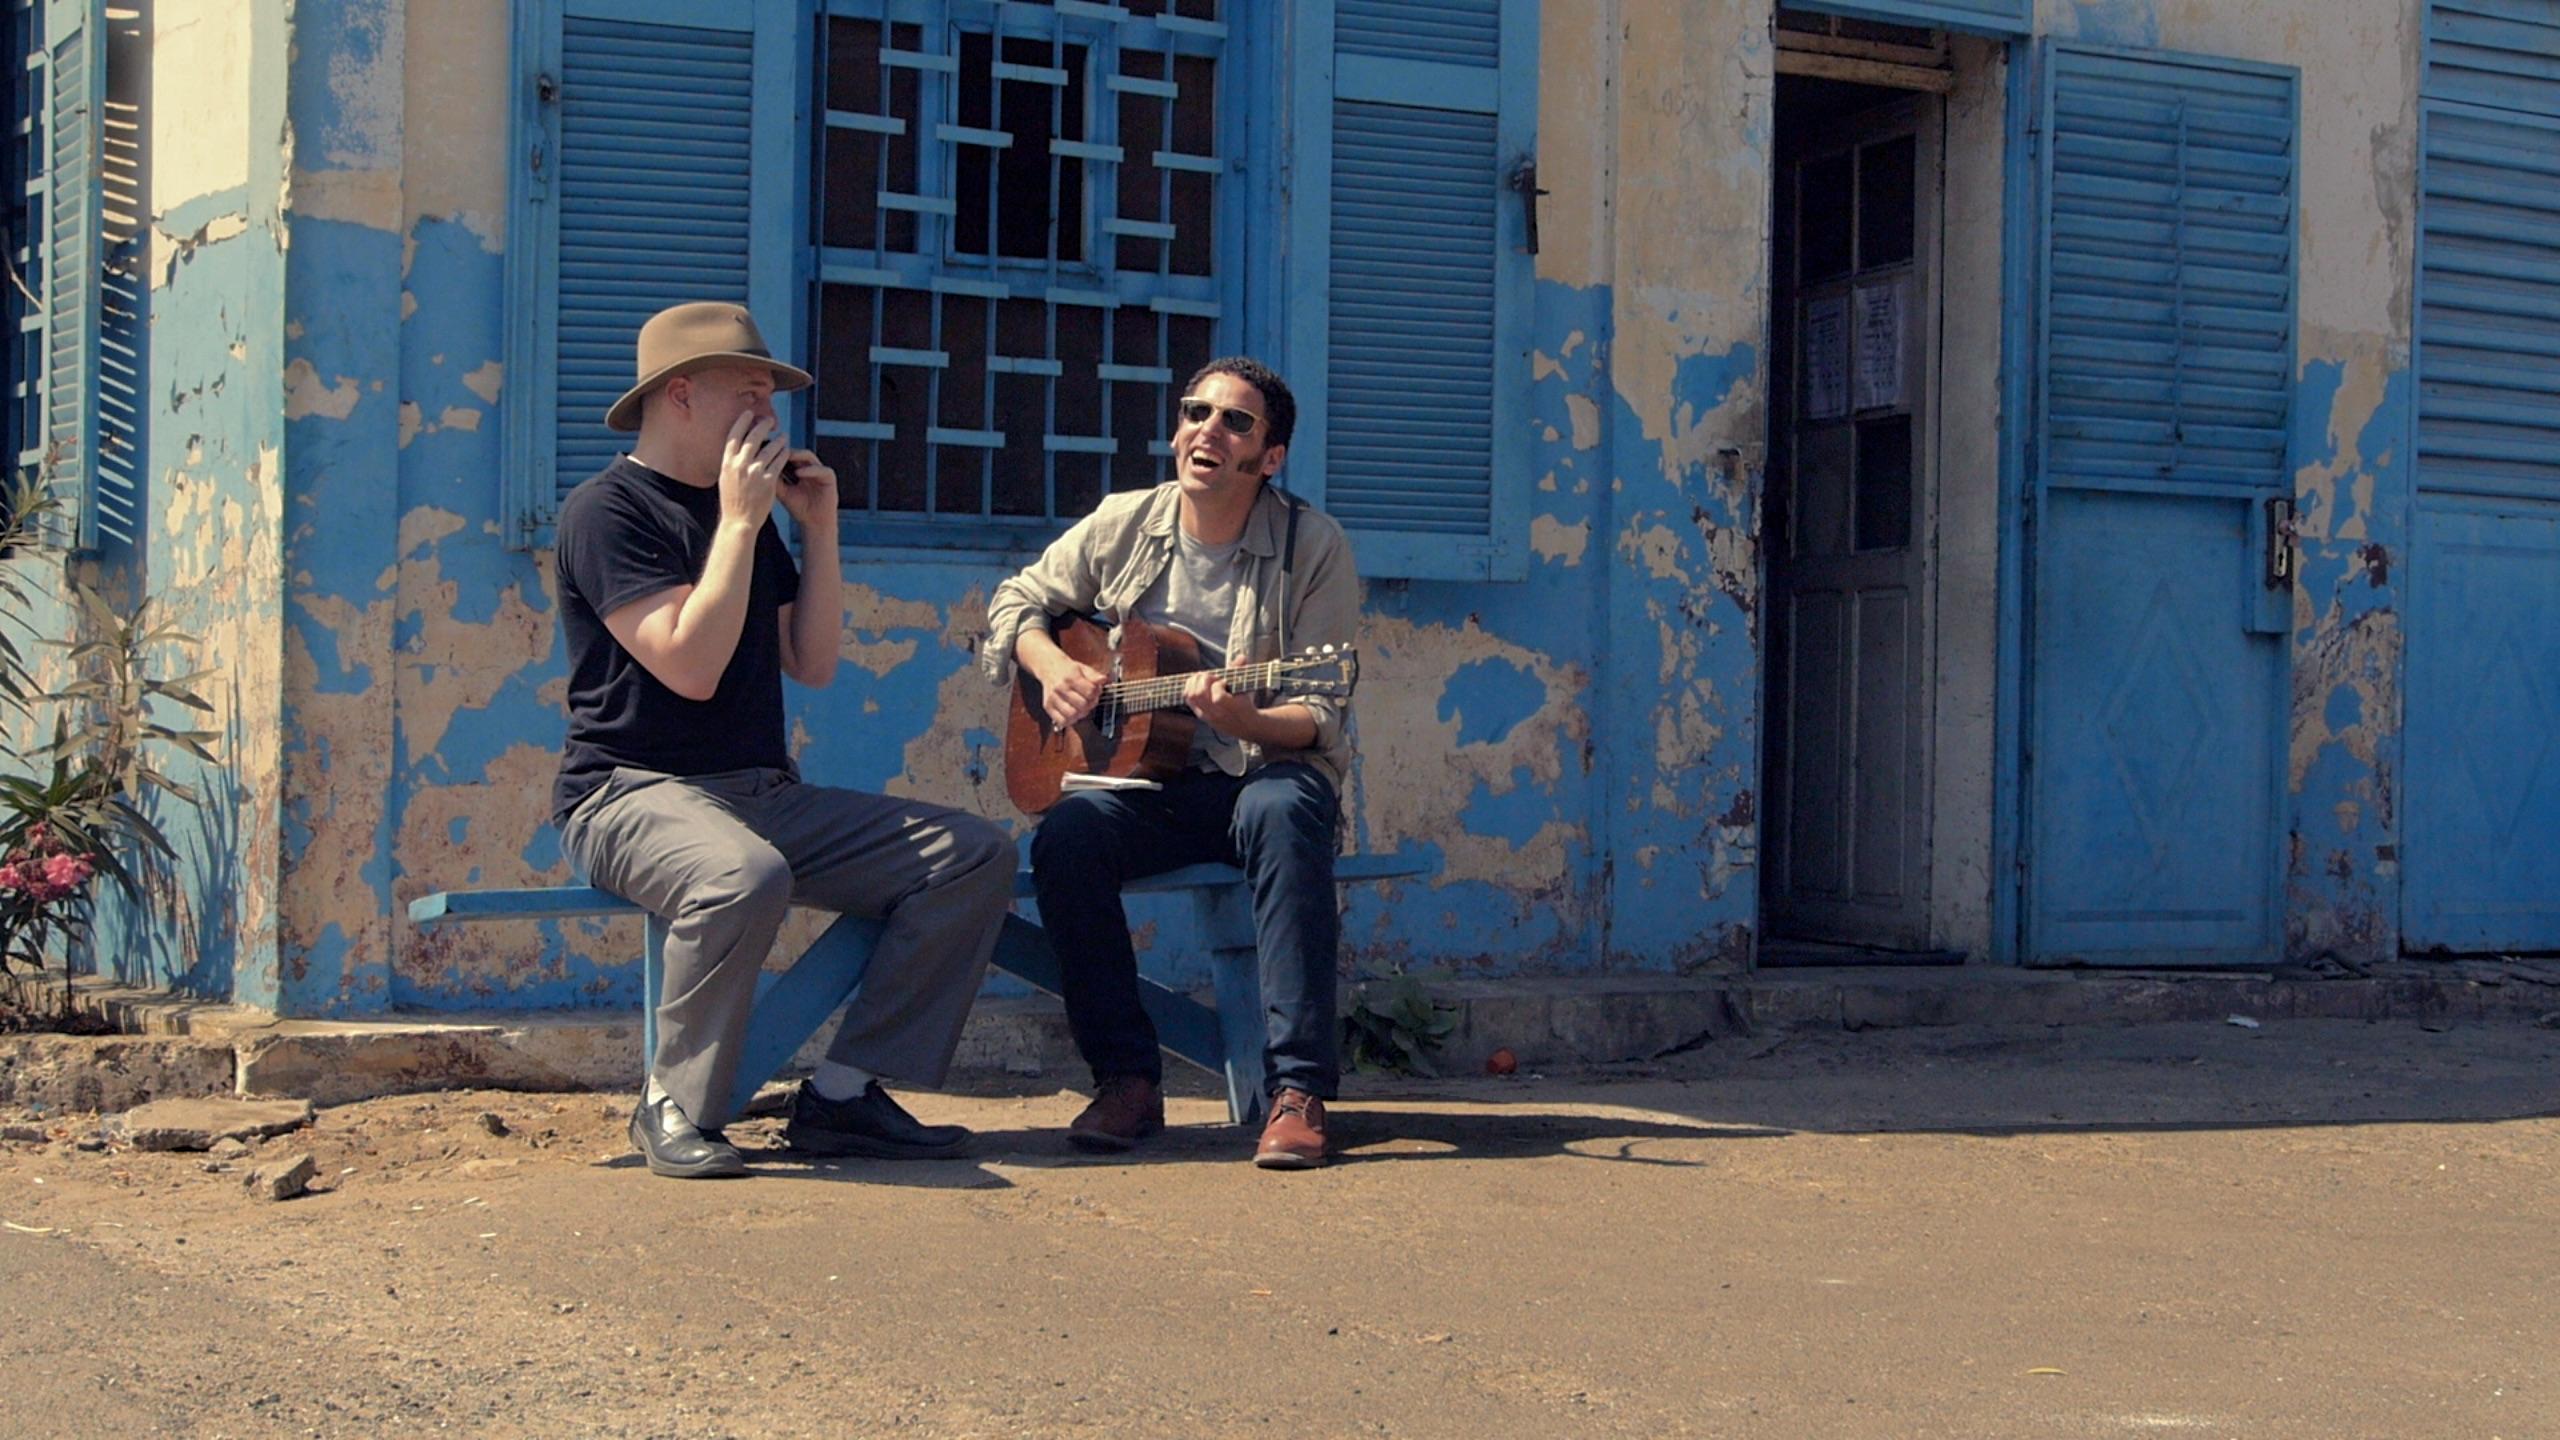 Casamance la banda sonora de un viajem<br/> <span>Zapata Paloma, Spagna</span>